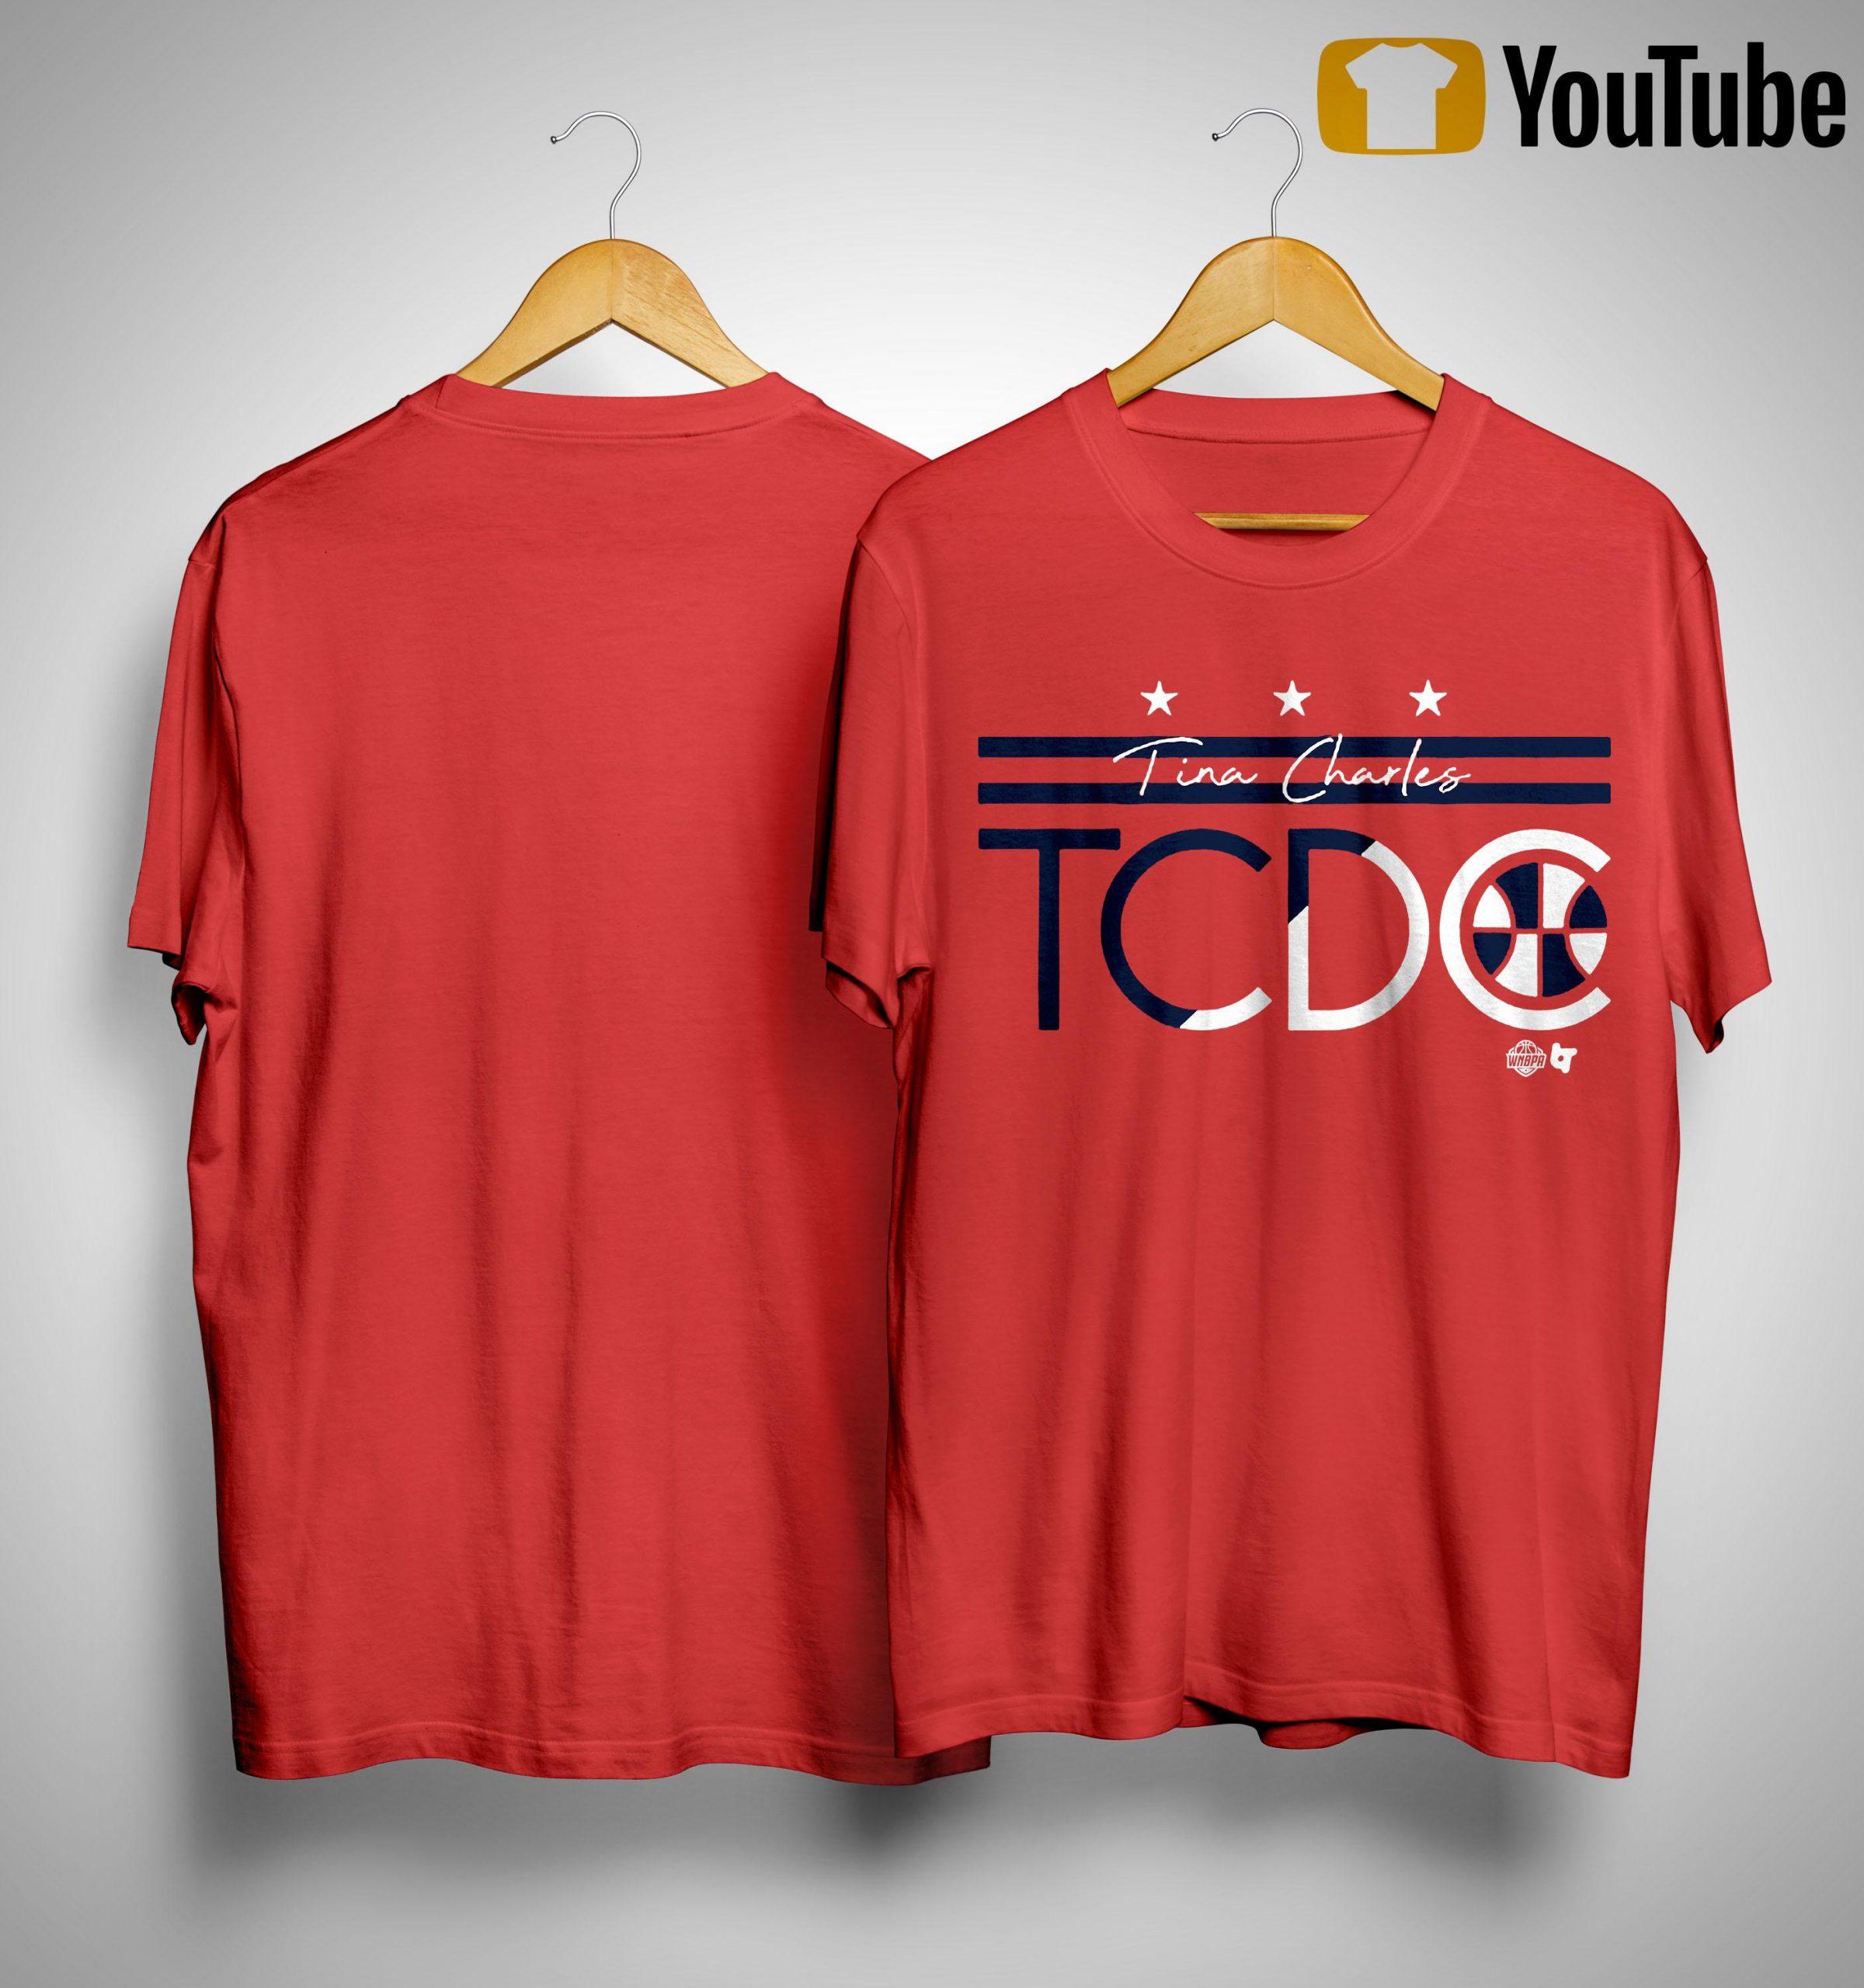 Tina Charles Shirt